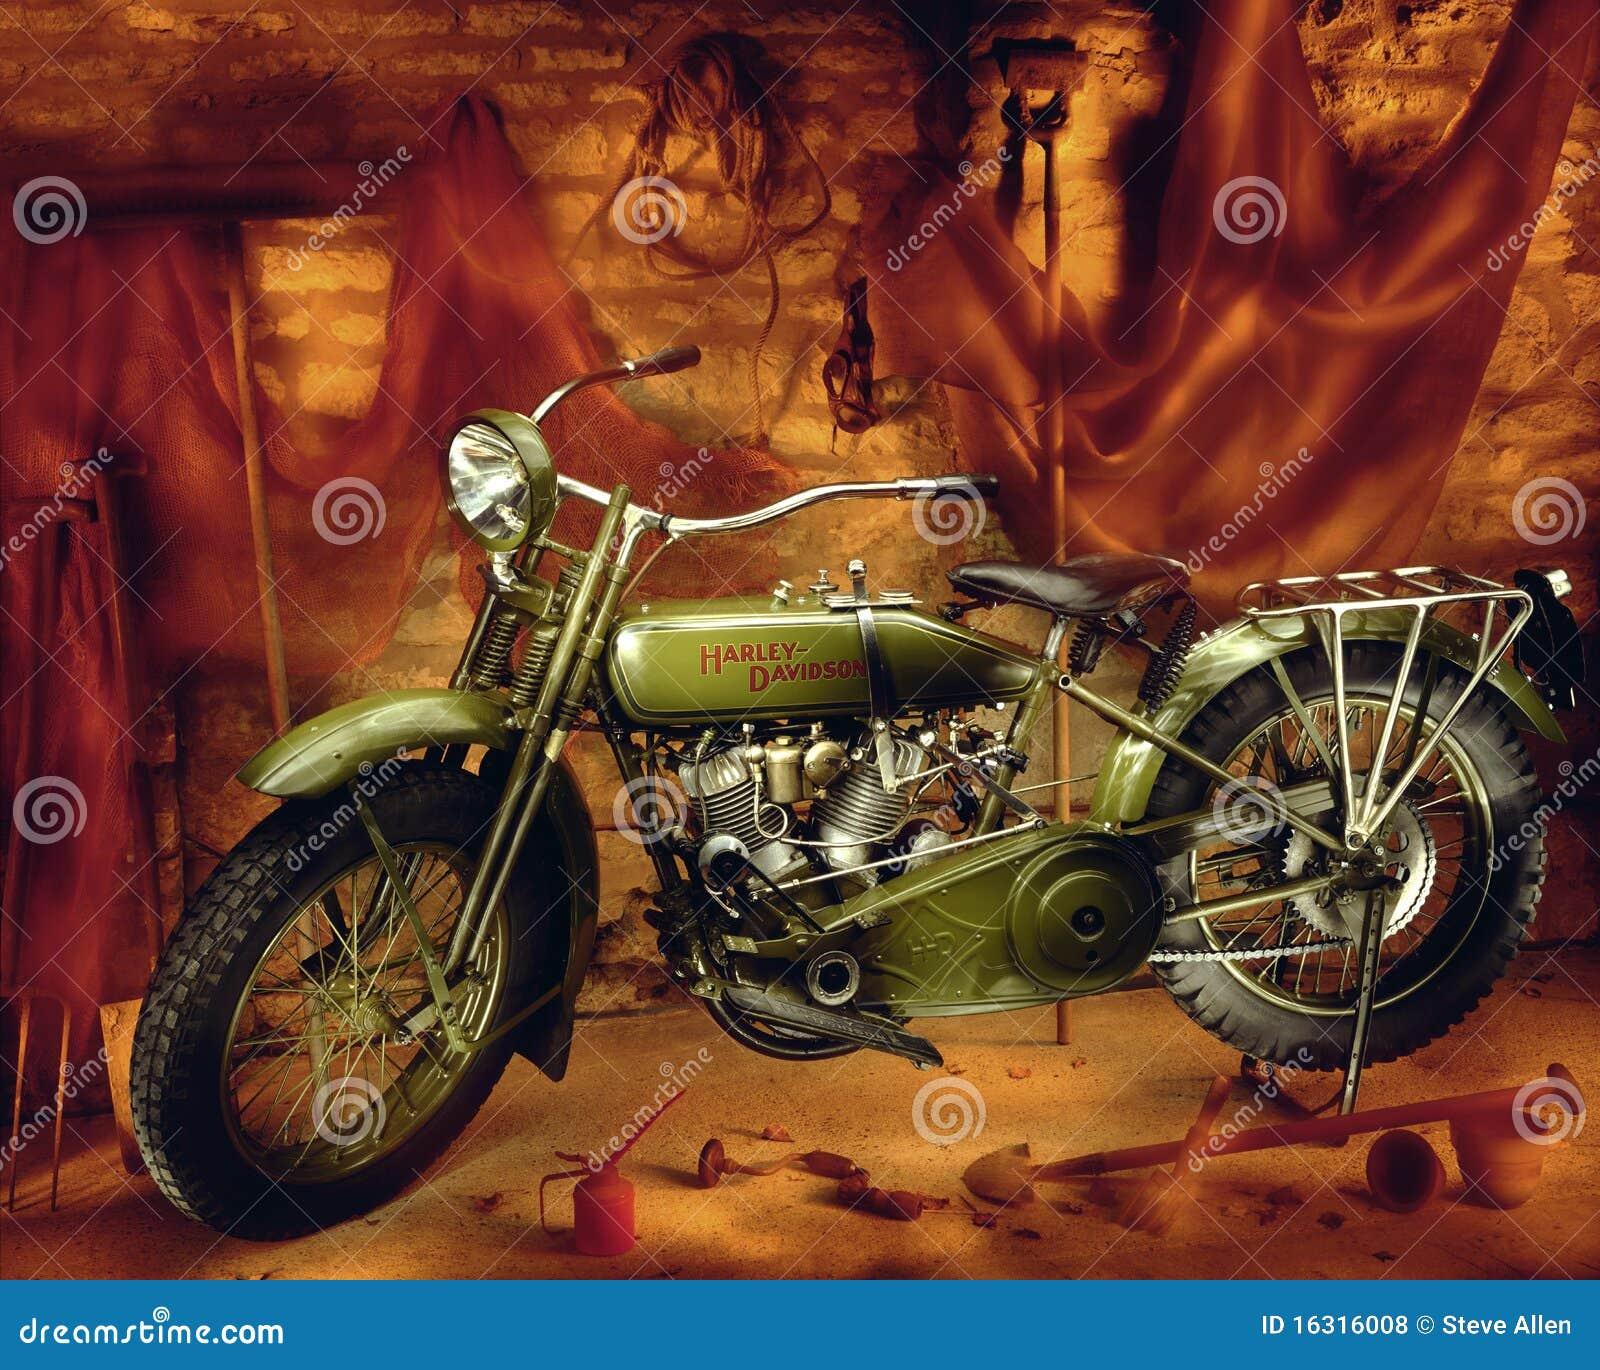 Harley Davidson Motorcycle Vintage 1910 Editorial Stock